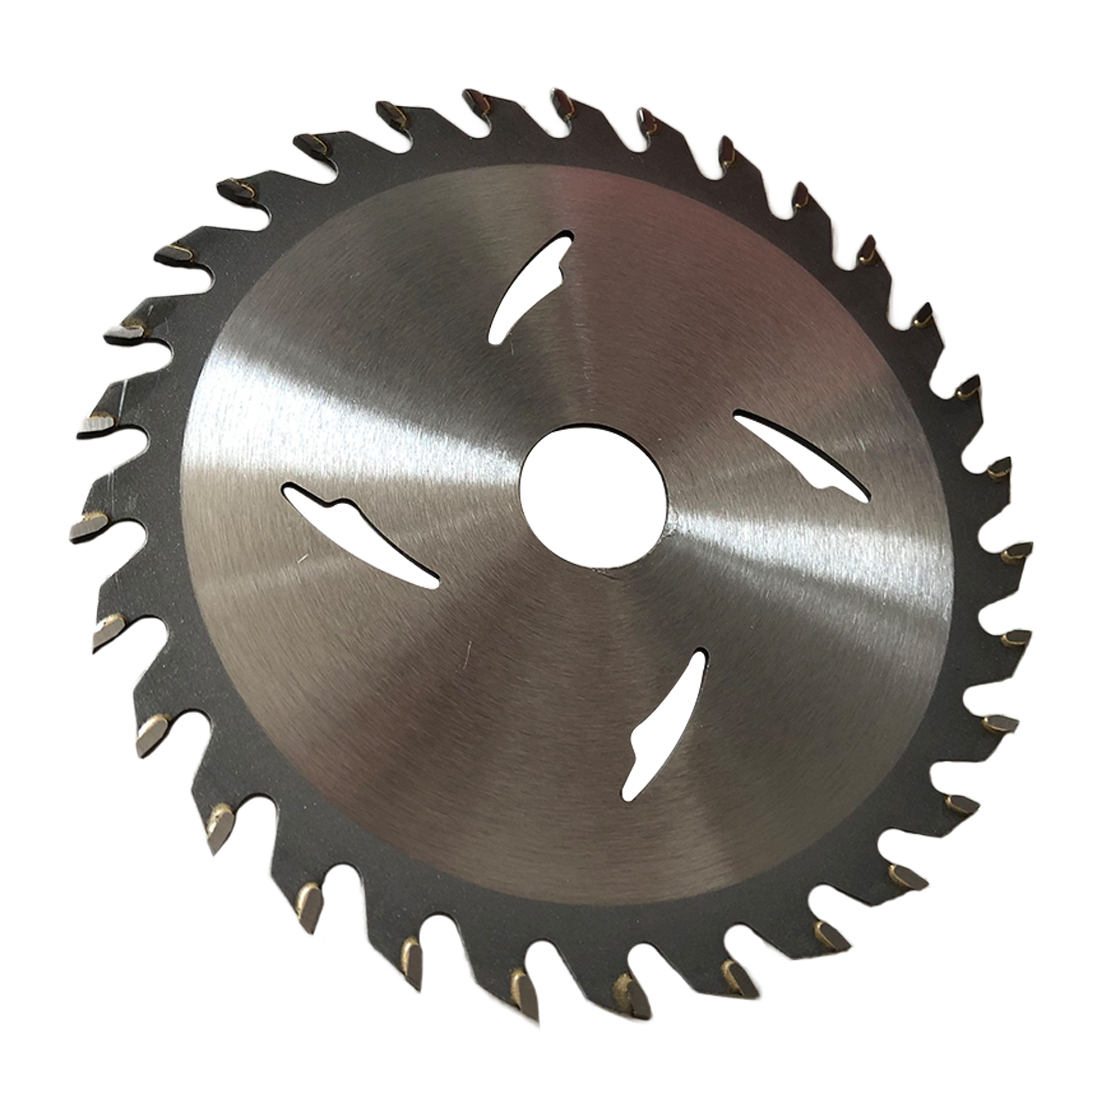 1PC TCT Sharp And Durable Wood Cutting Disc Saw Blade Carbide Tipped Saw Blade Cutting Piece Circular Saw